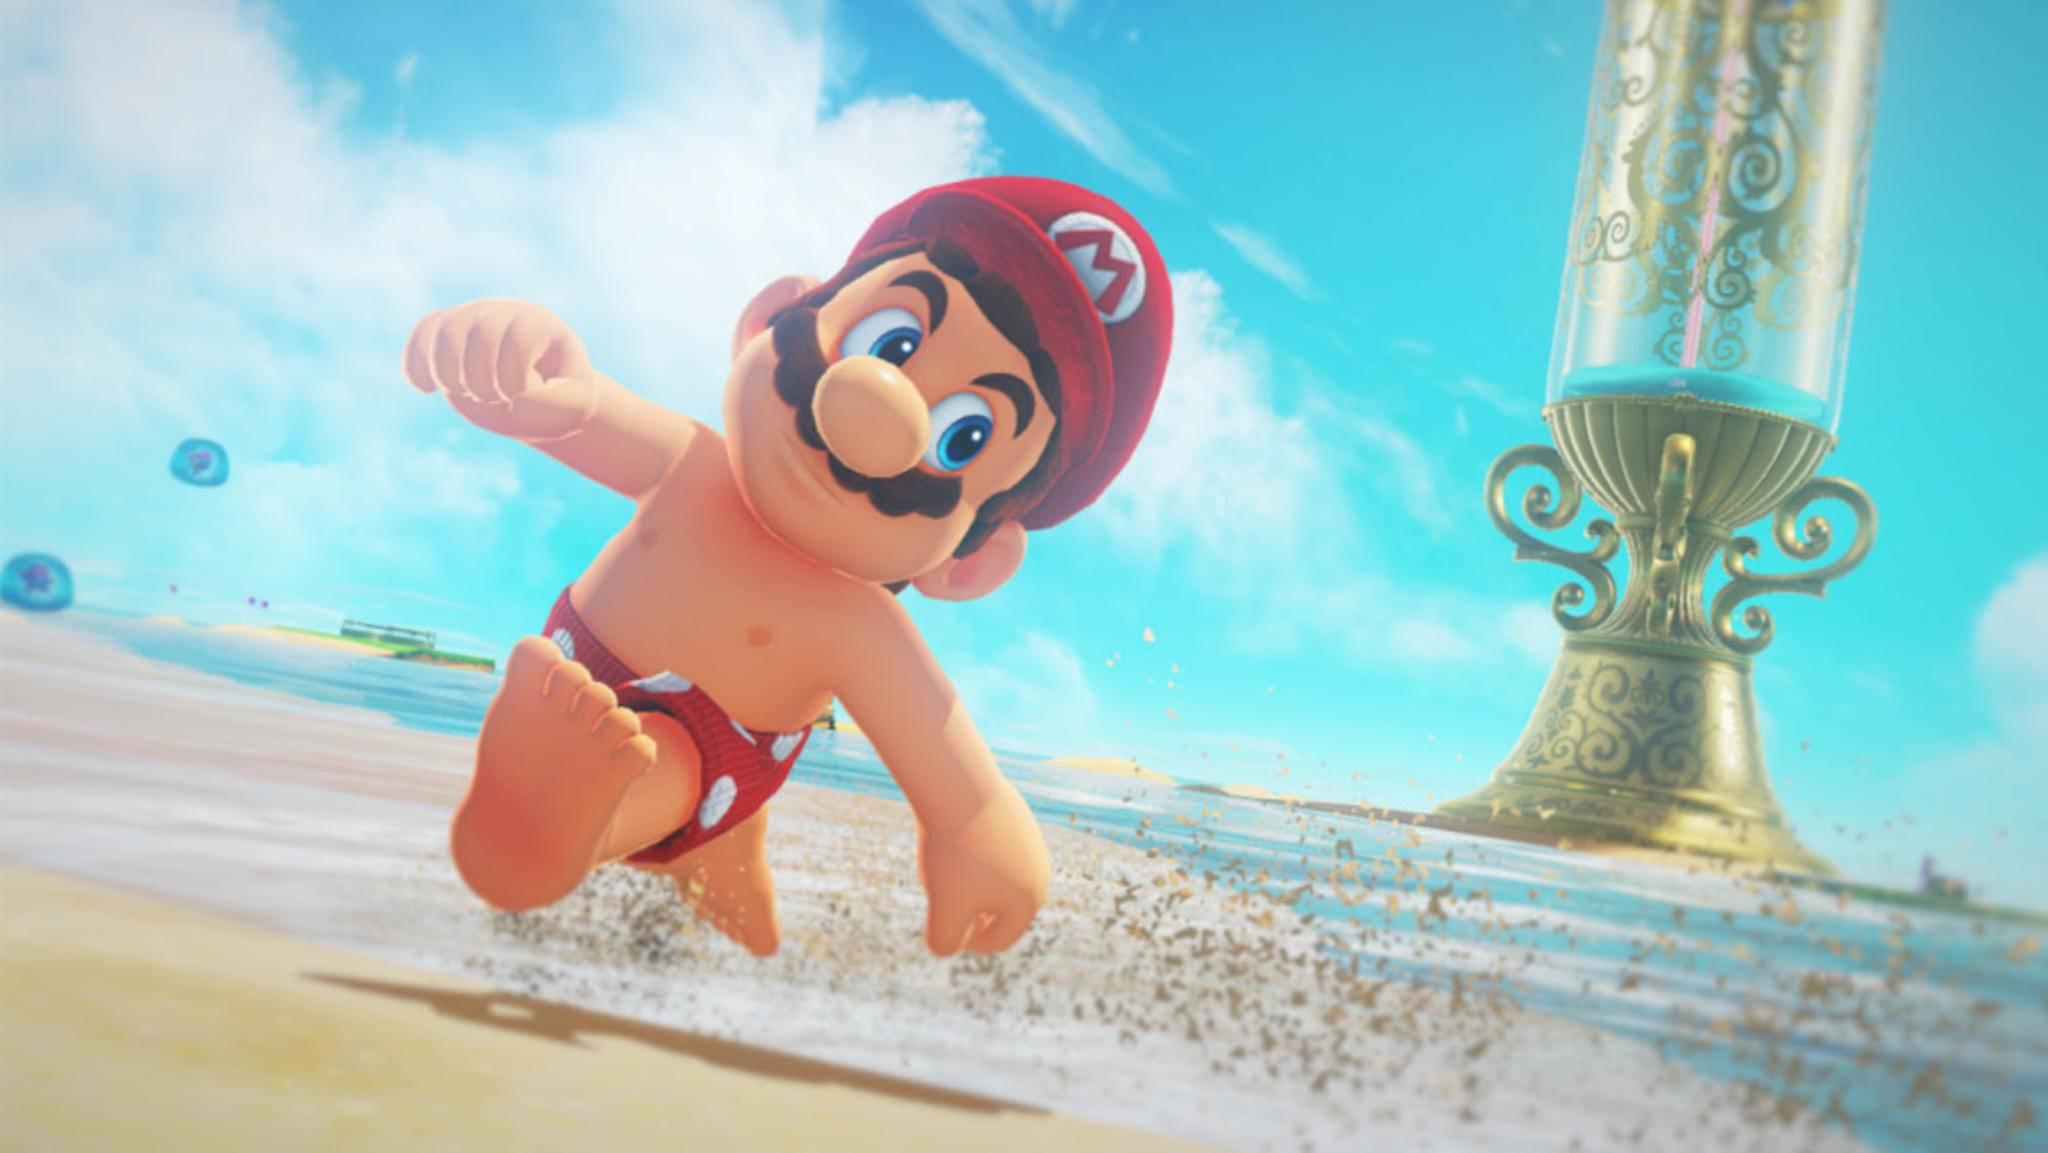 Wenn es um Marios Körper geht, sind Nintendo-Fans aufmerksamer als Nintendo selbst.